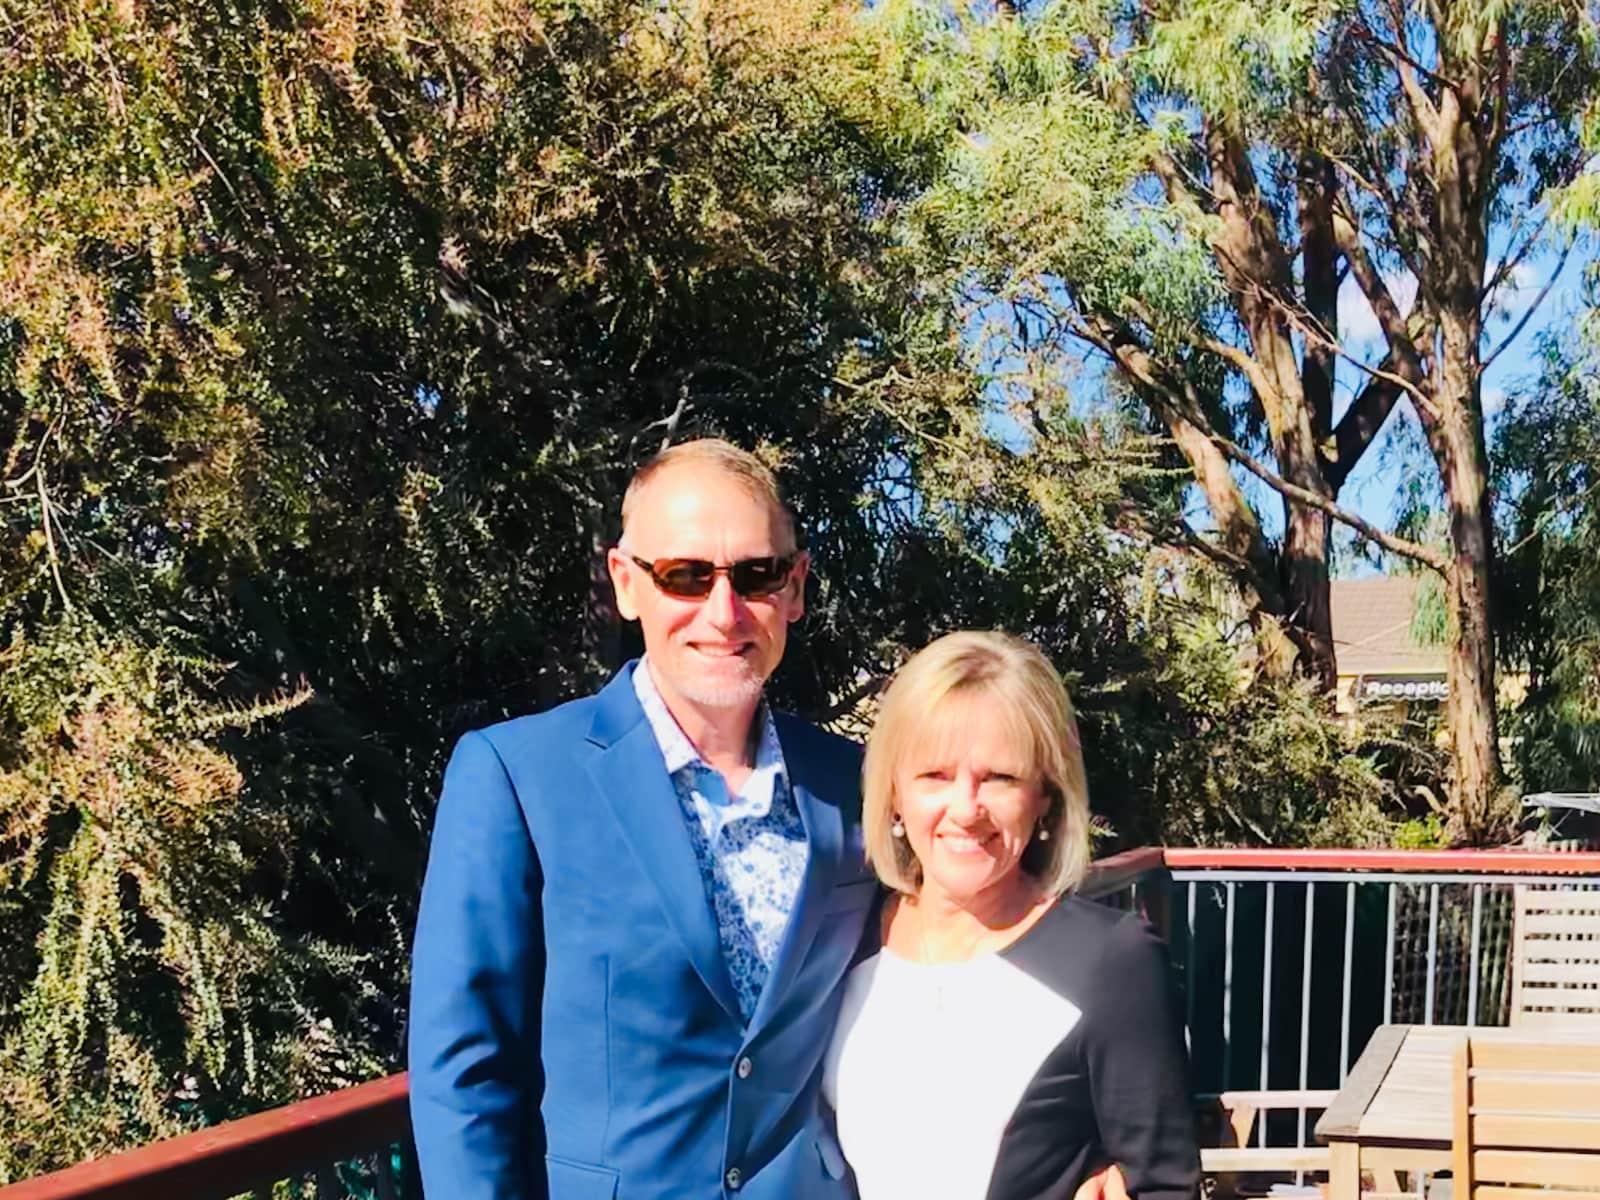 Debbie n allen & Allen from Quindalup, Western Australia, Australia